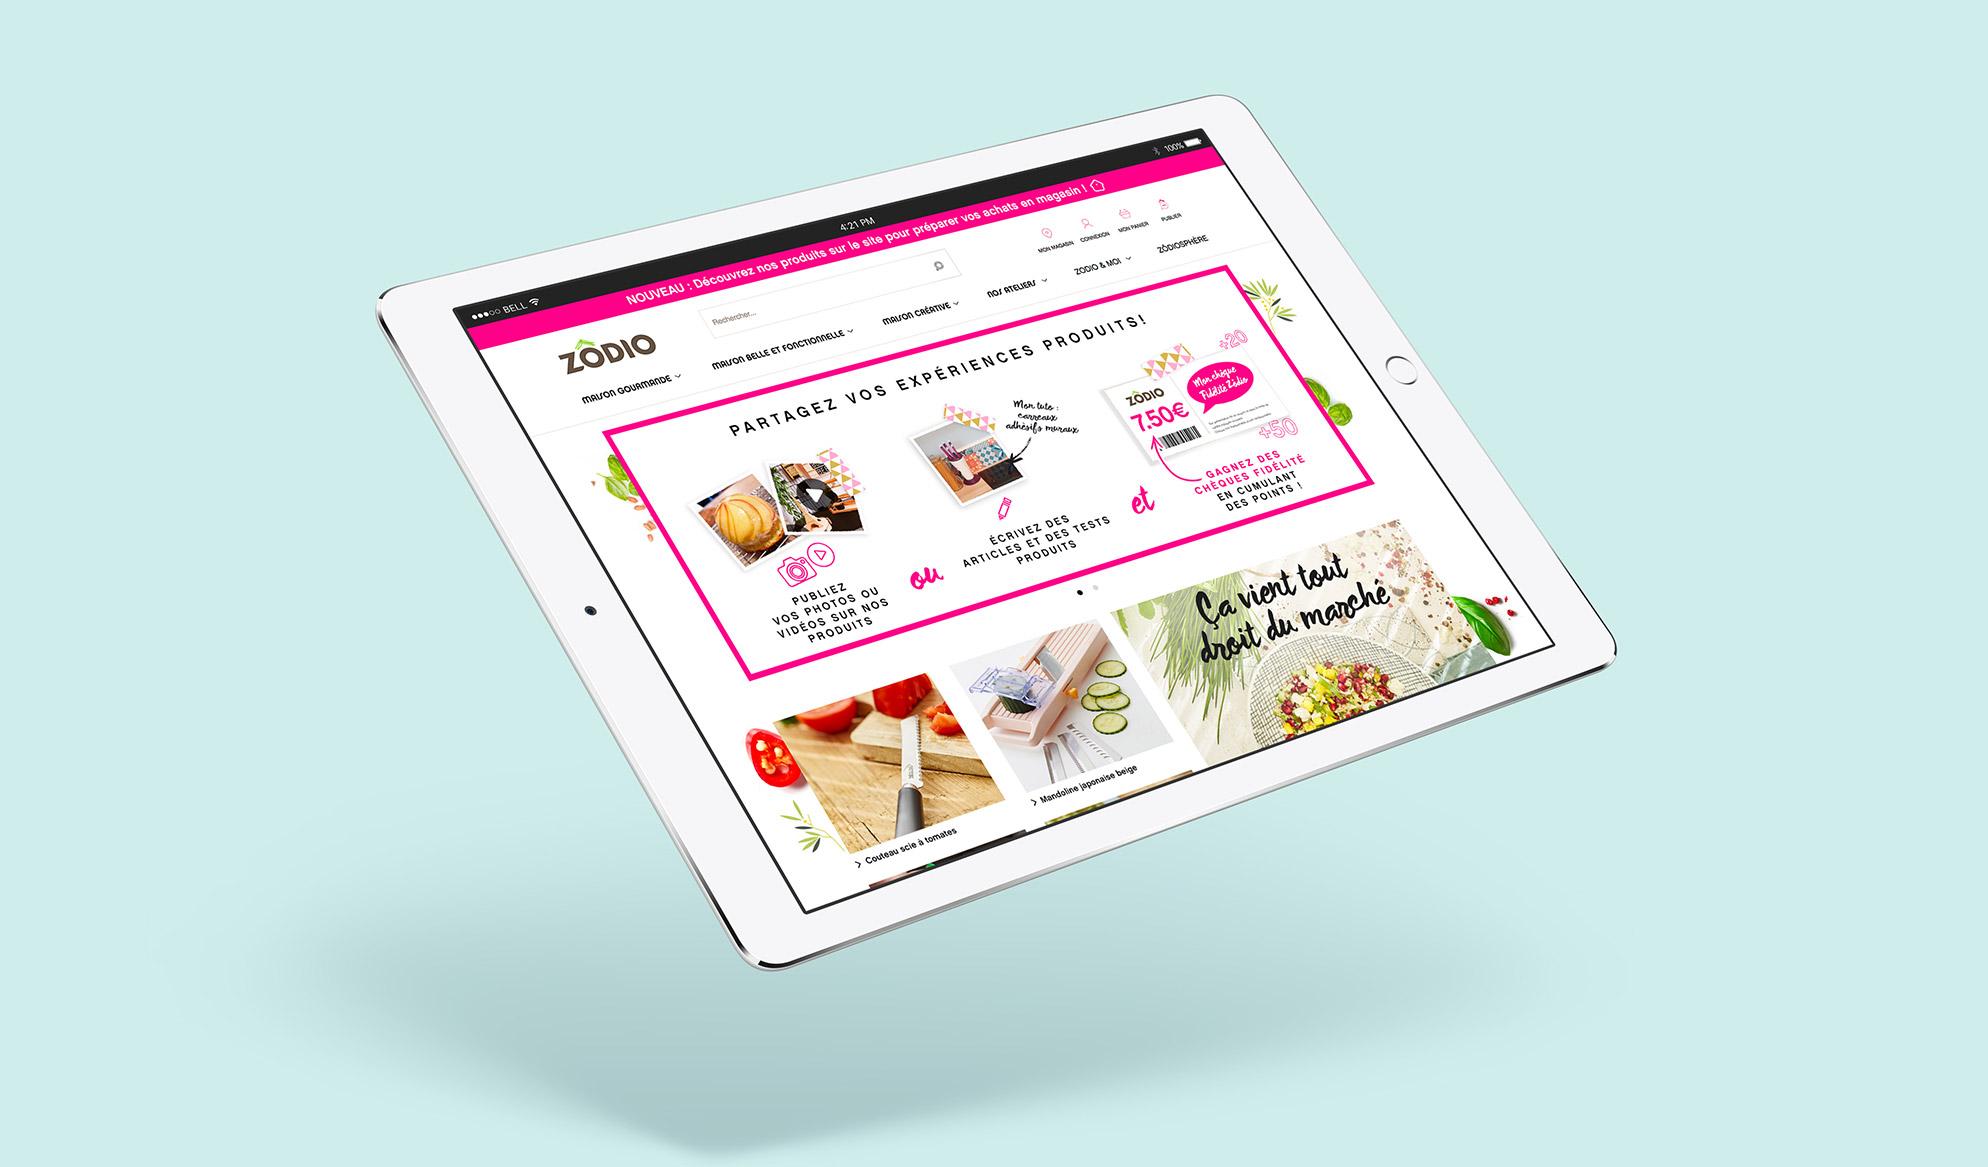 Image mockup tablette site Zodio